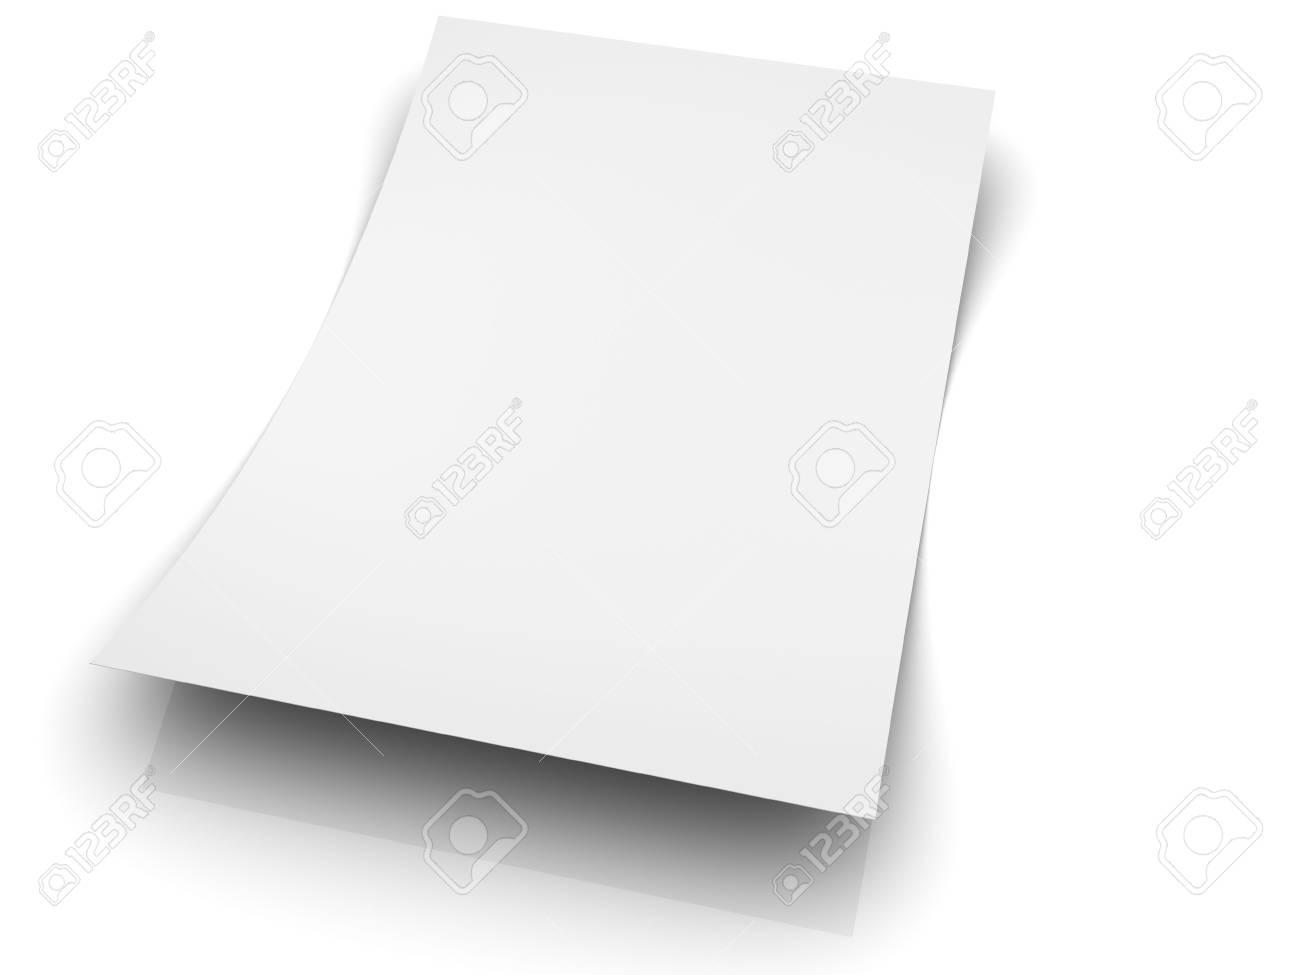 Blank sheet Stock Photo - 4501662